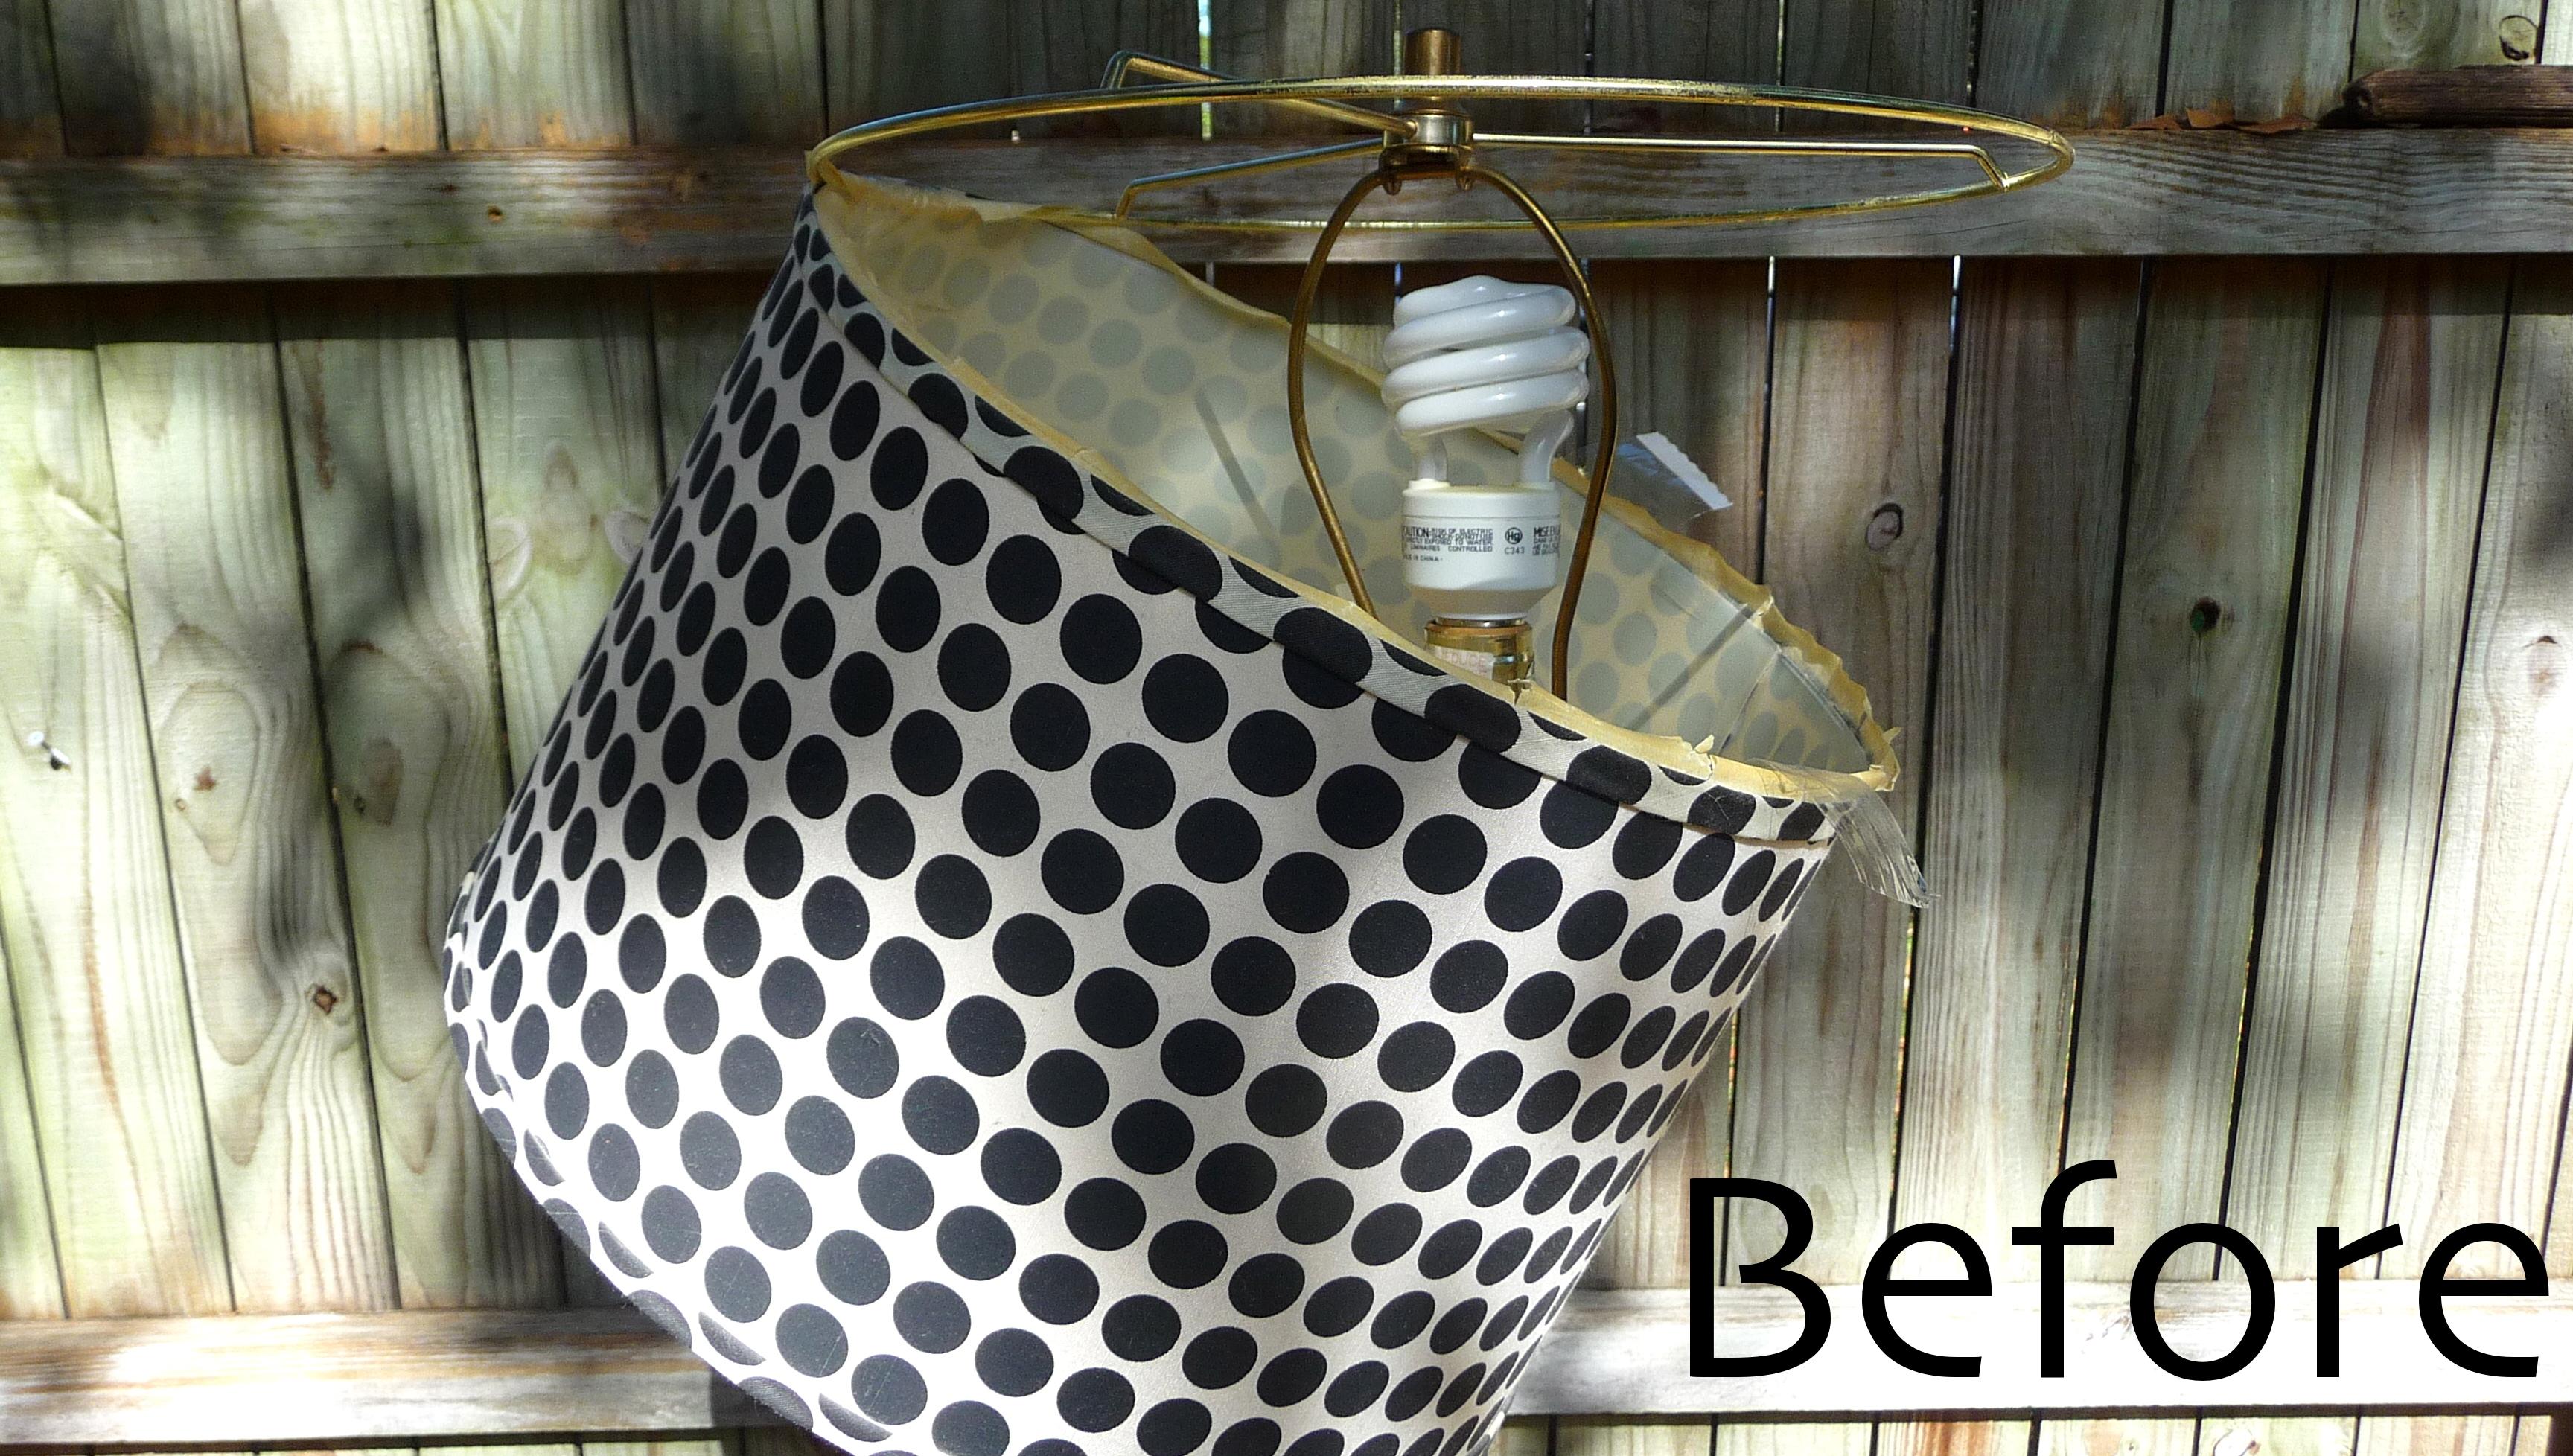 Diy garden burlap lamp shade craft organic lamp shade mozeypictures Gallery